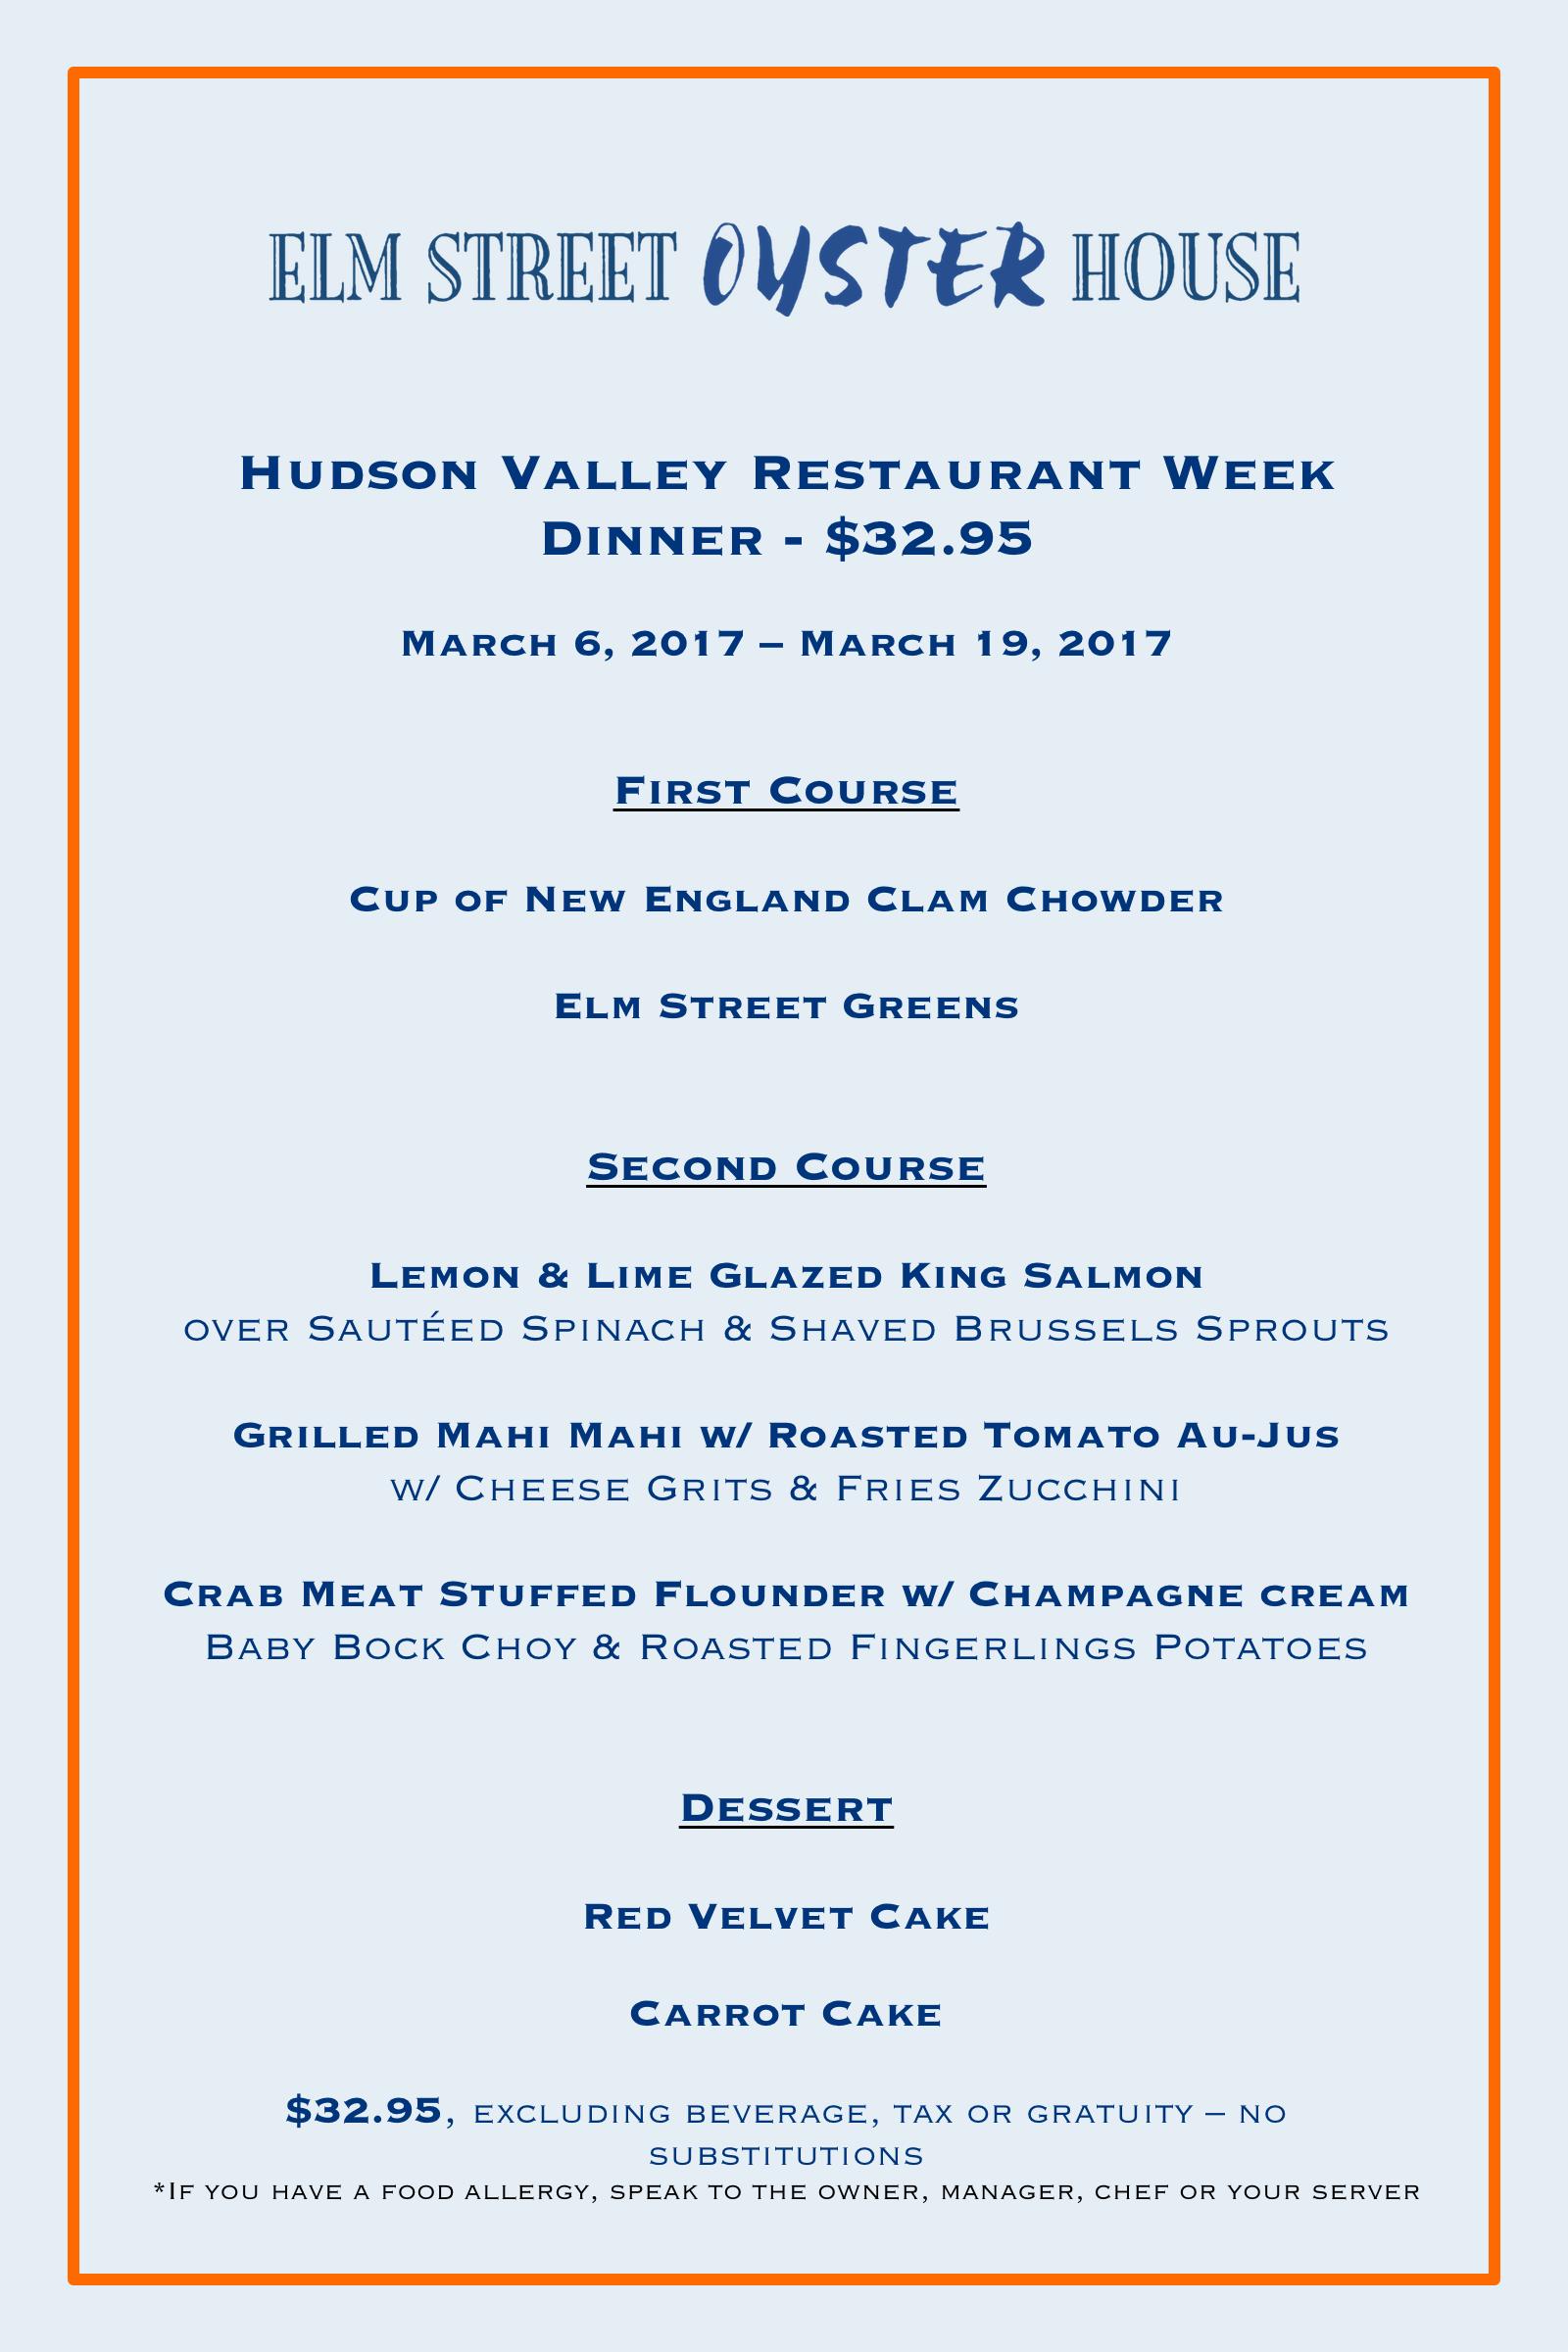 Elm Street Oyster House Hudson Valley Restaurant Week